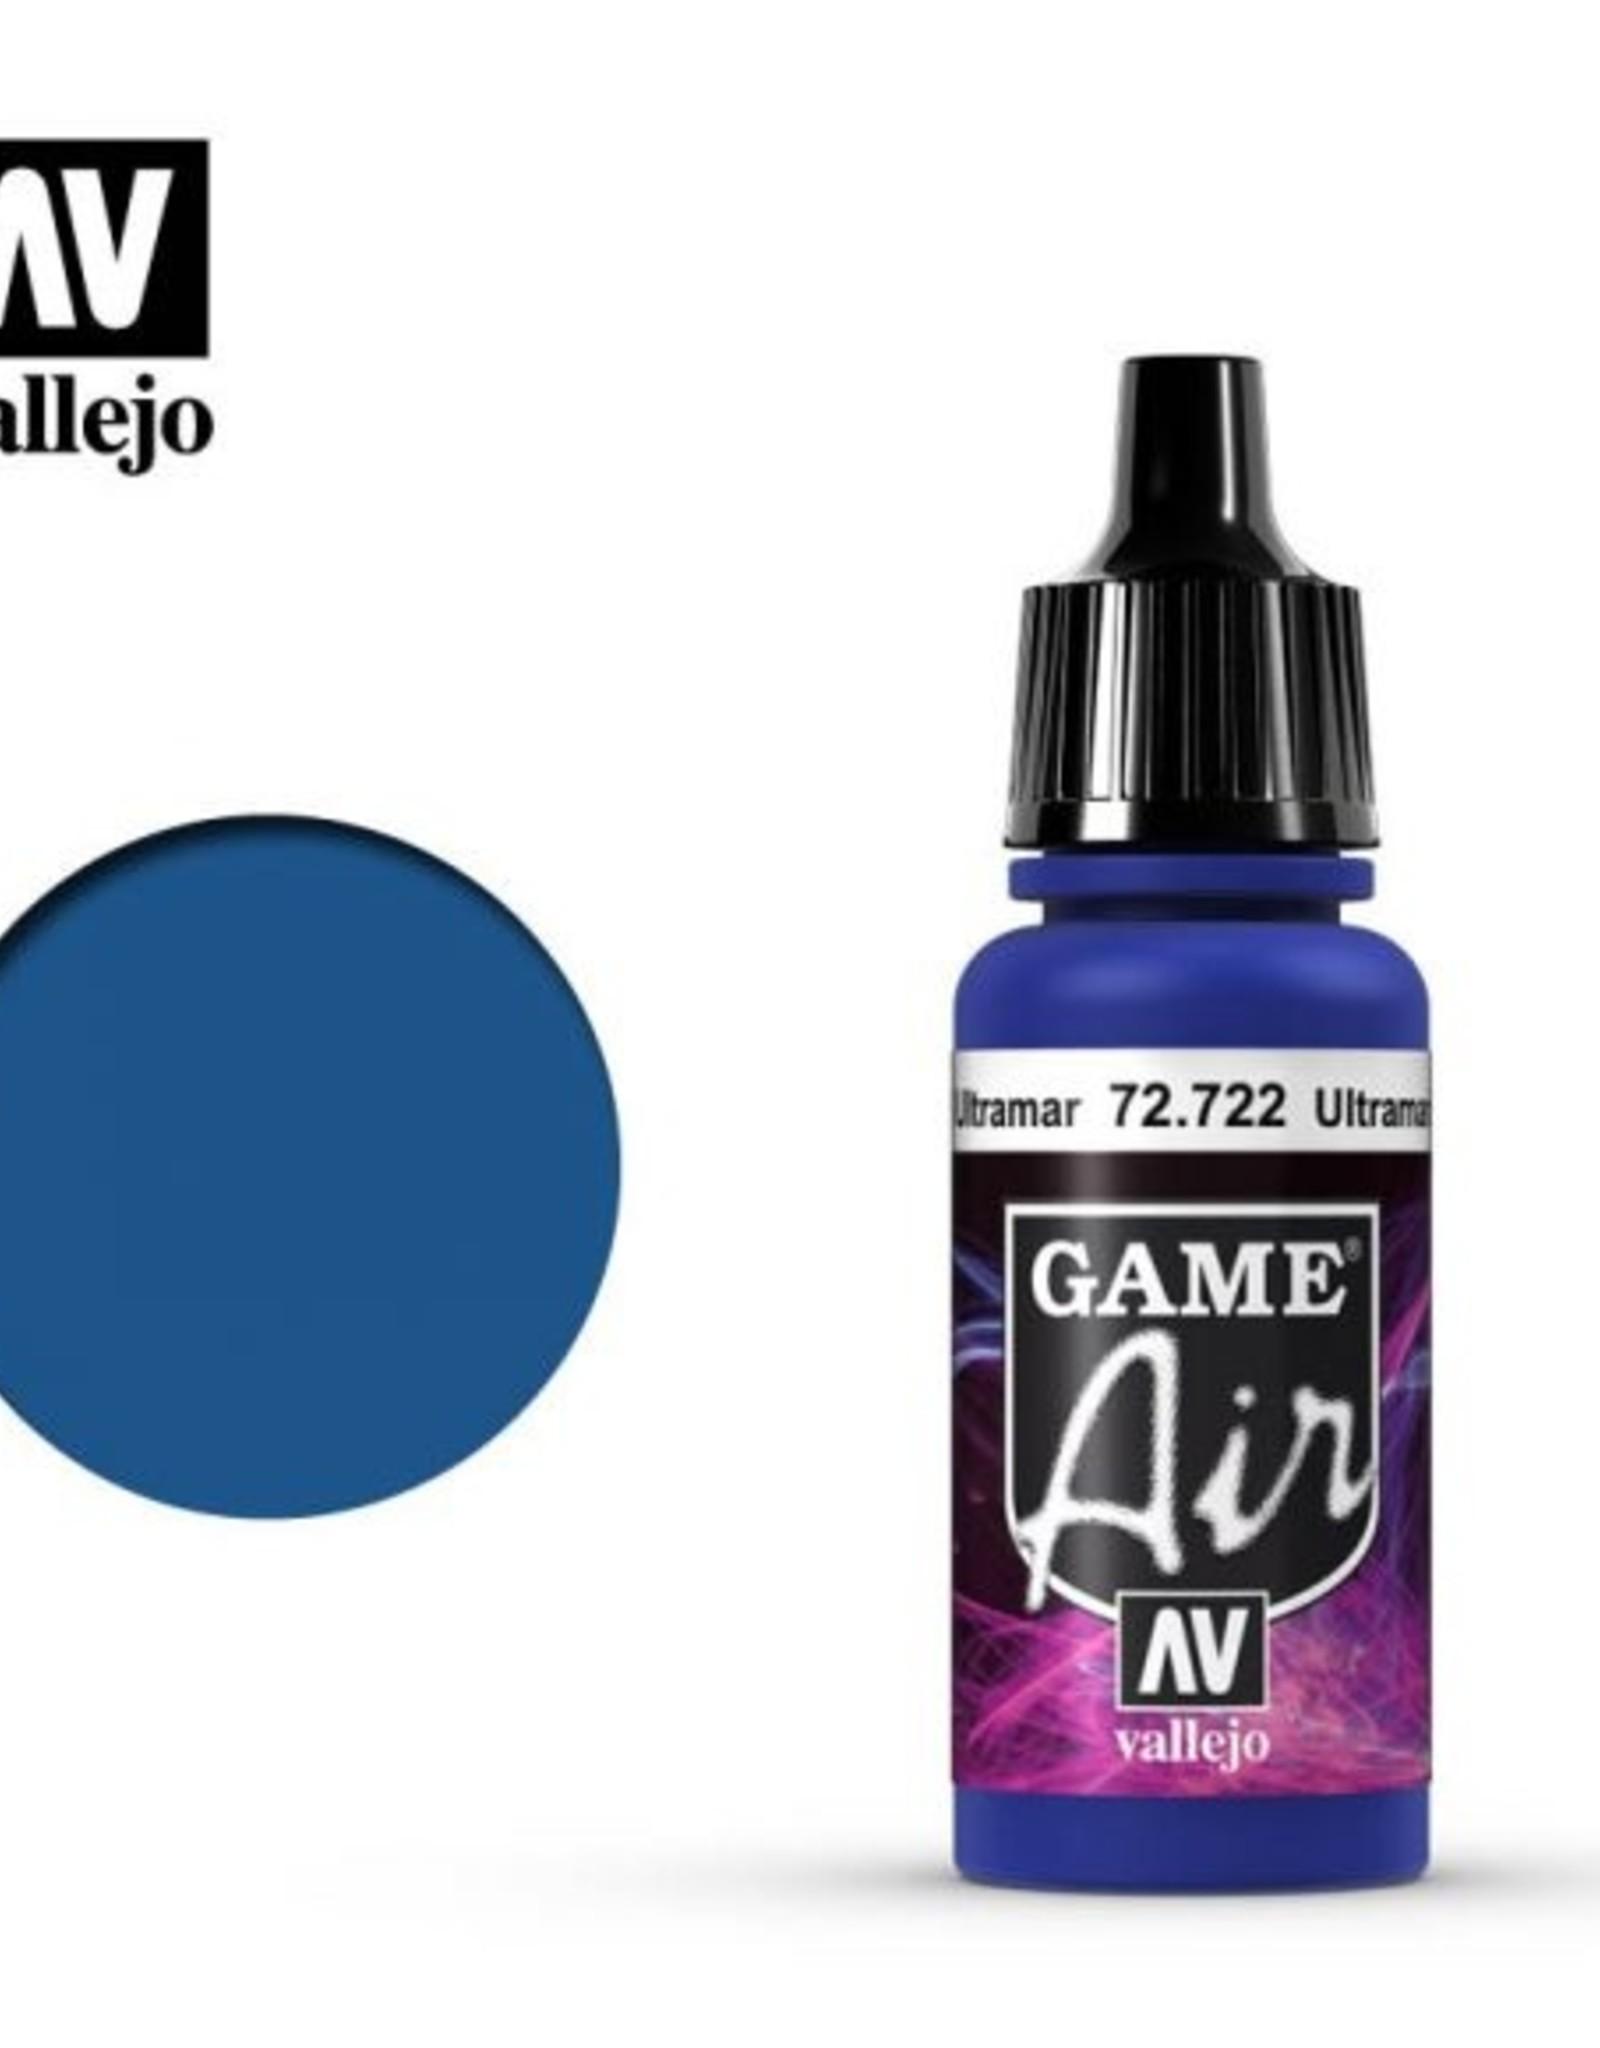 Vallejo Game Air: 72.722 Ultramarine Blue